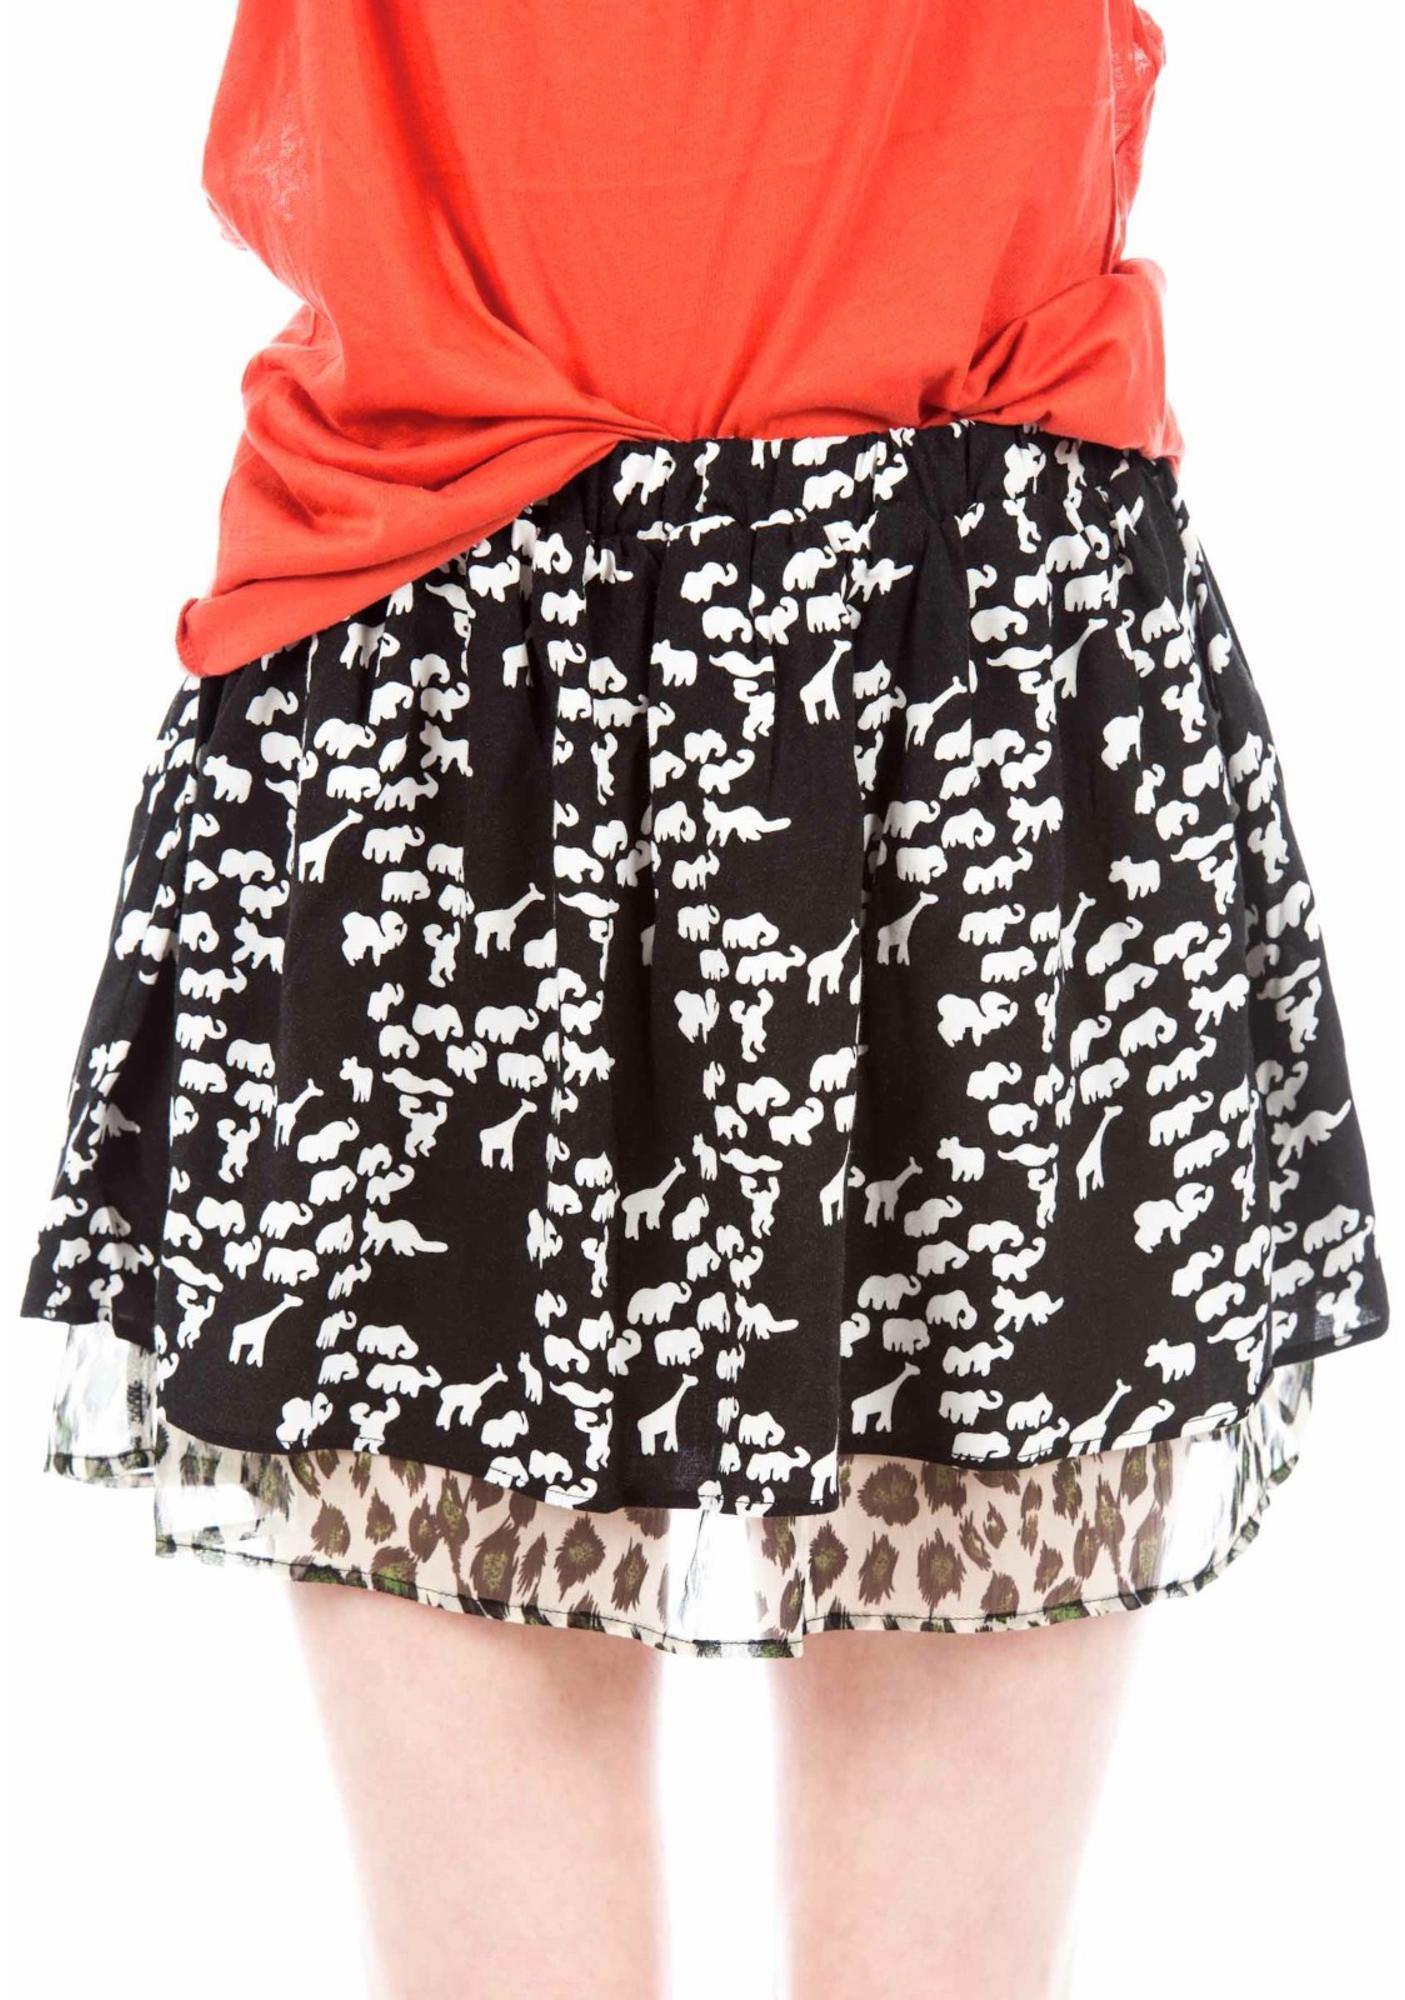 Under The Table Pleats Skirt